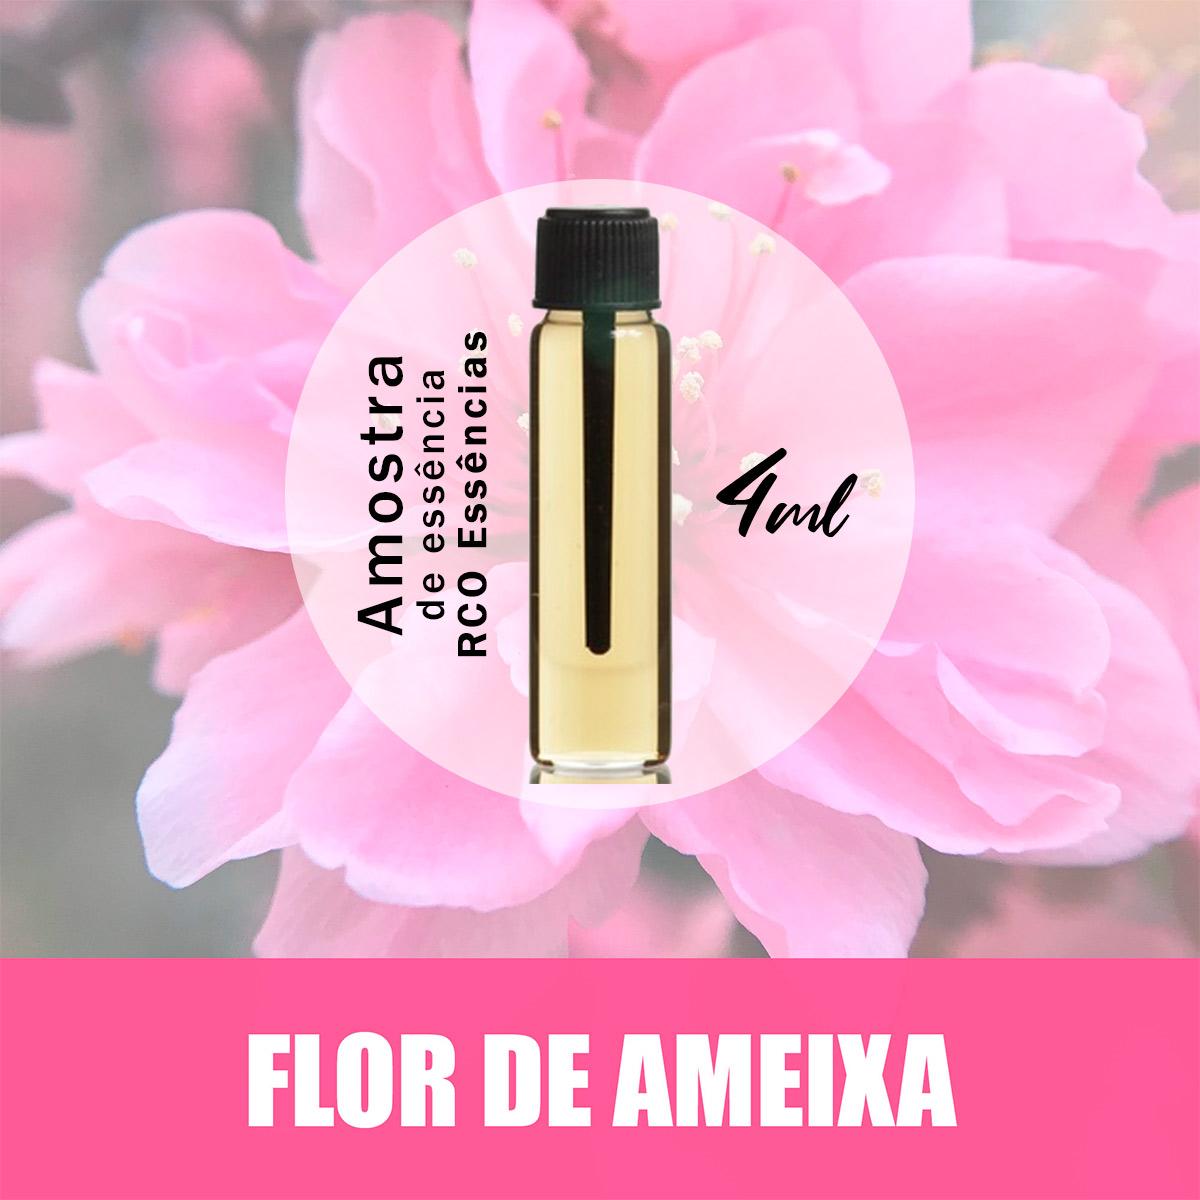 Amostra Essência - Flor de Ameixa